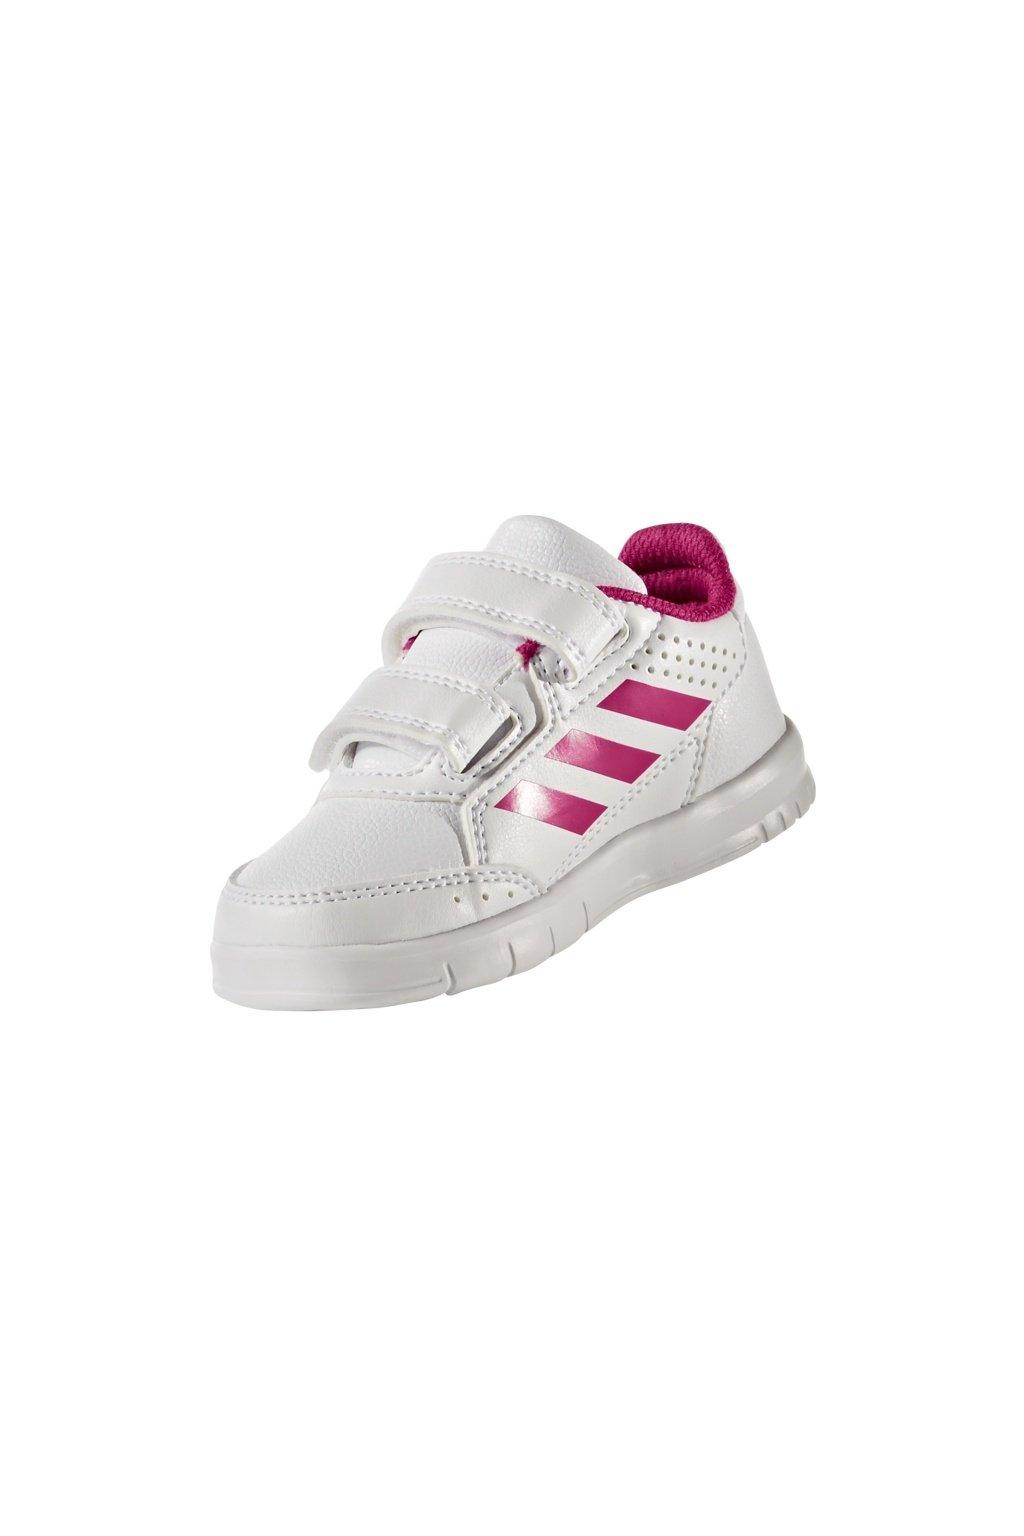 0a557c7cef4e ADIDAS ALTA SPORT CF I dievčenská obuv - Fresh sport